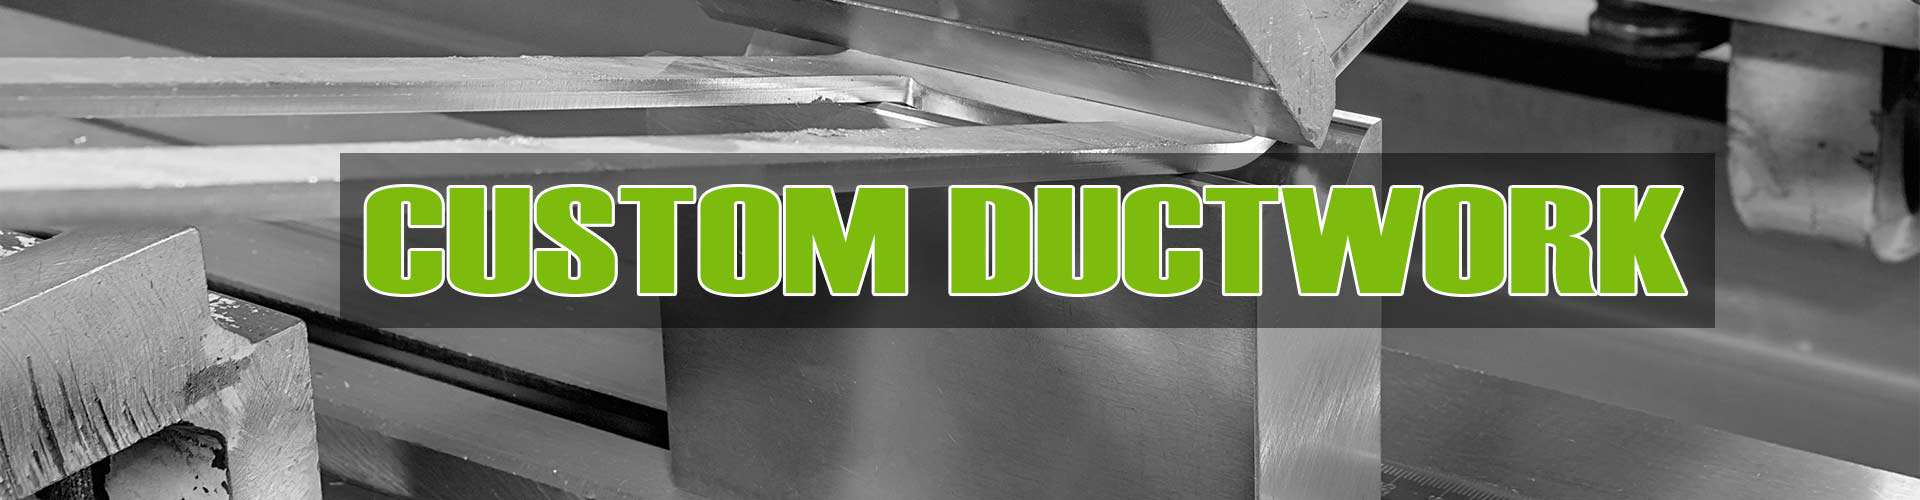 Custom Sheet Metal Ductwork in Elgin, Illinois